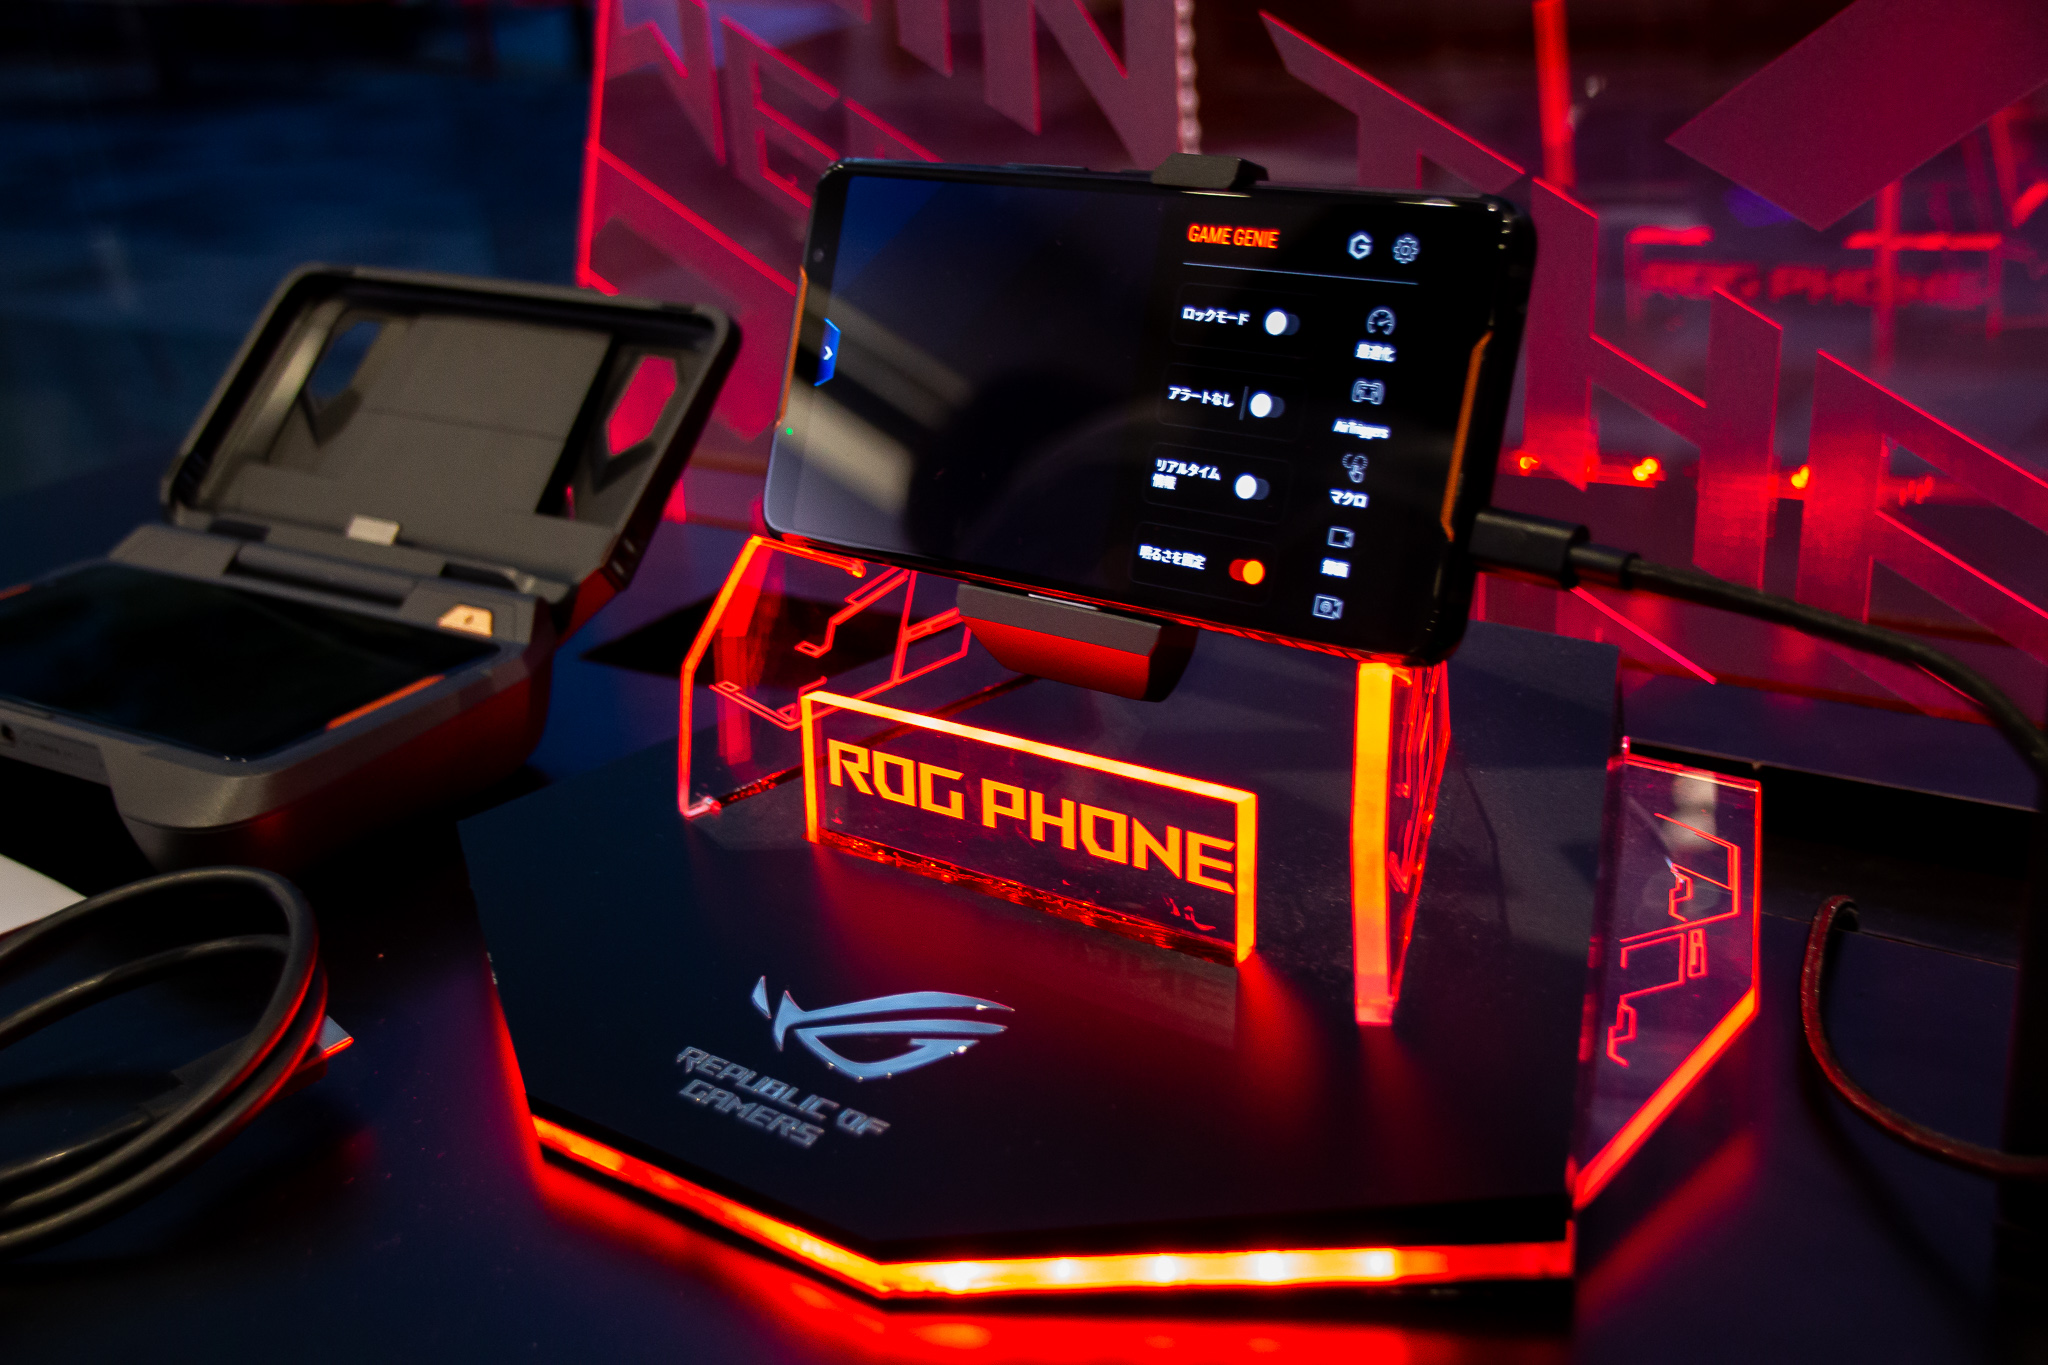 ASUS Store、ROG Phone ZS600KLの販売価格を2万円値下げ